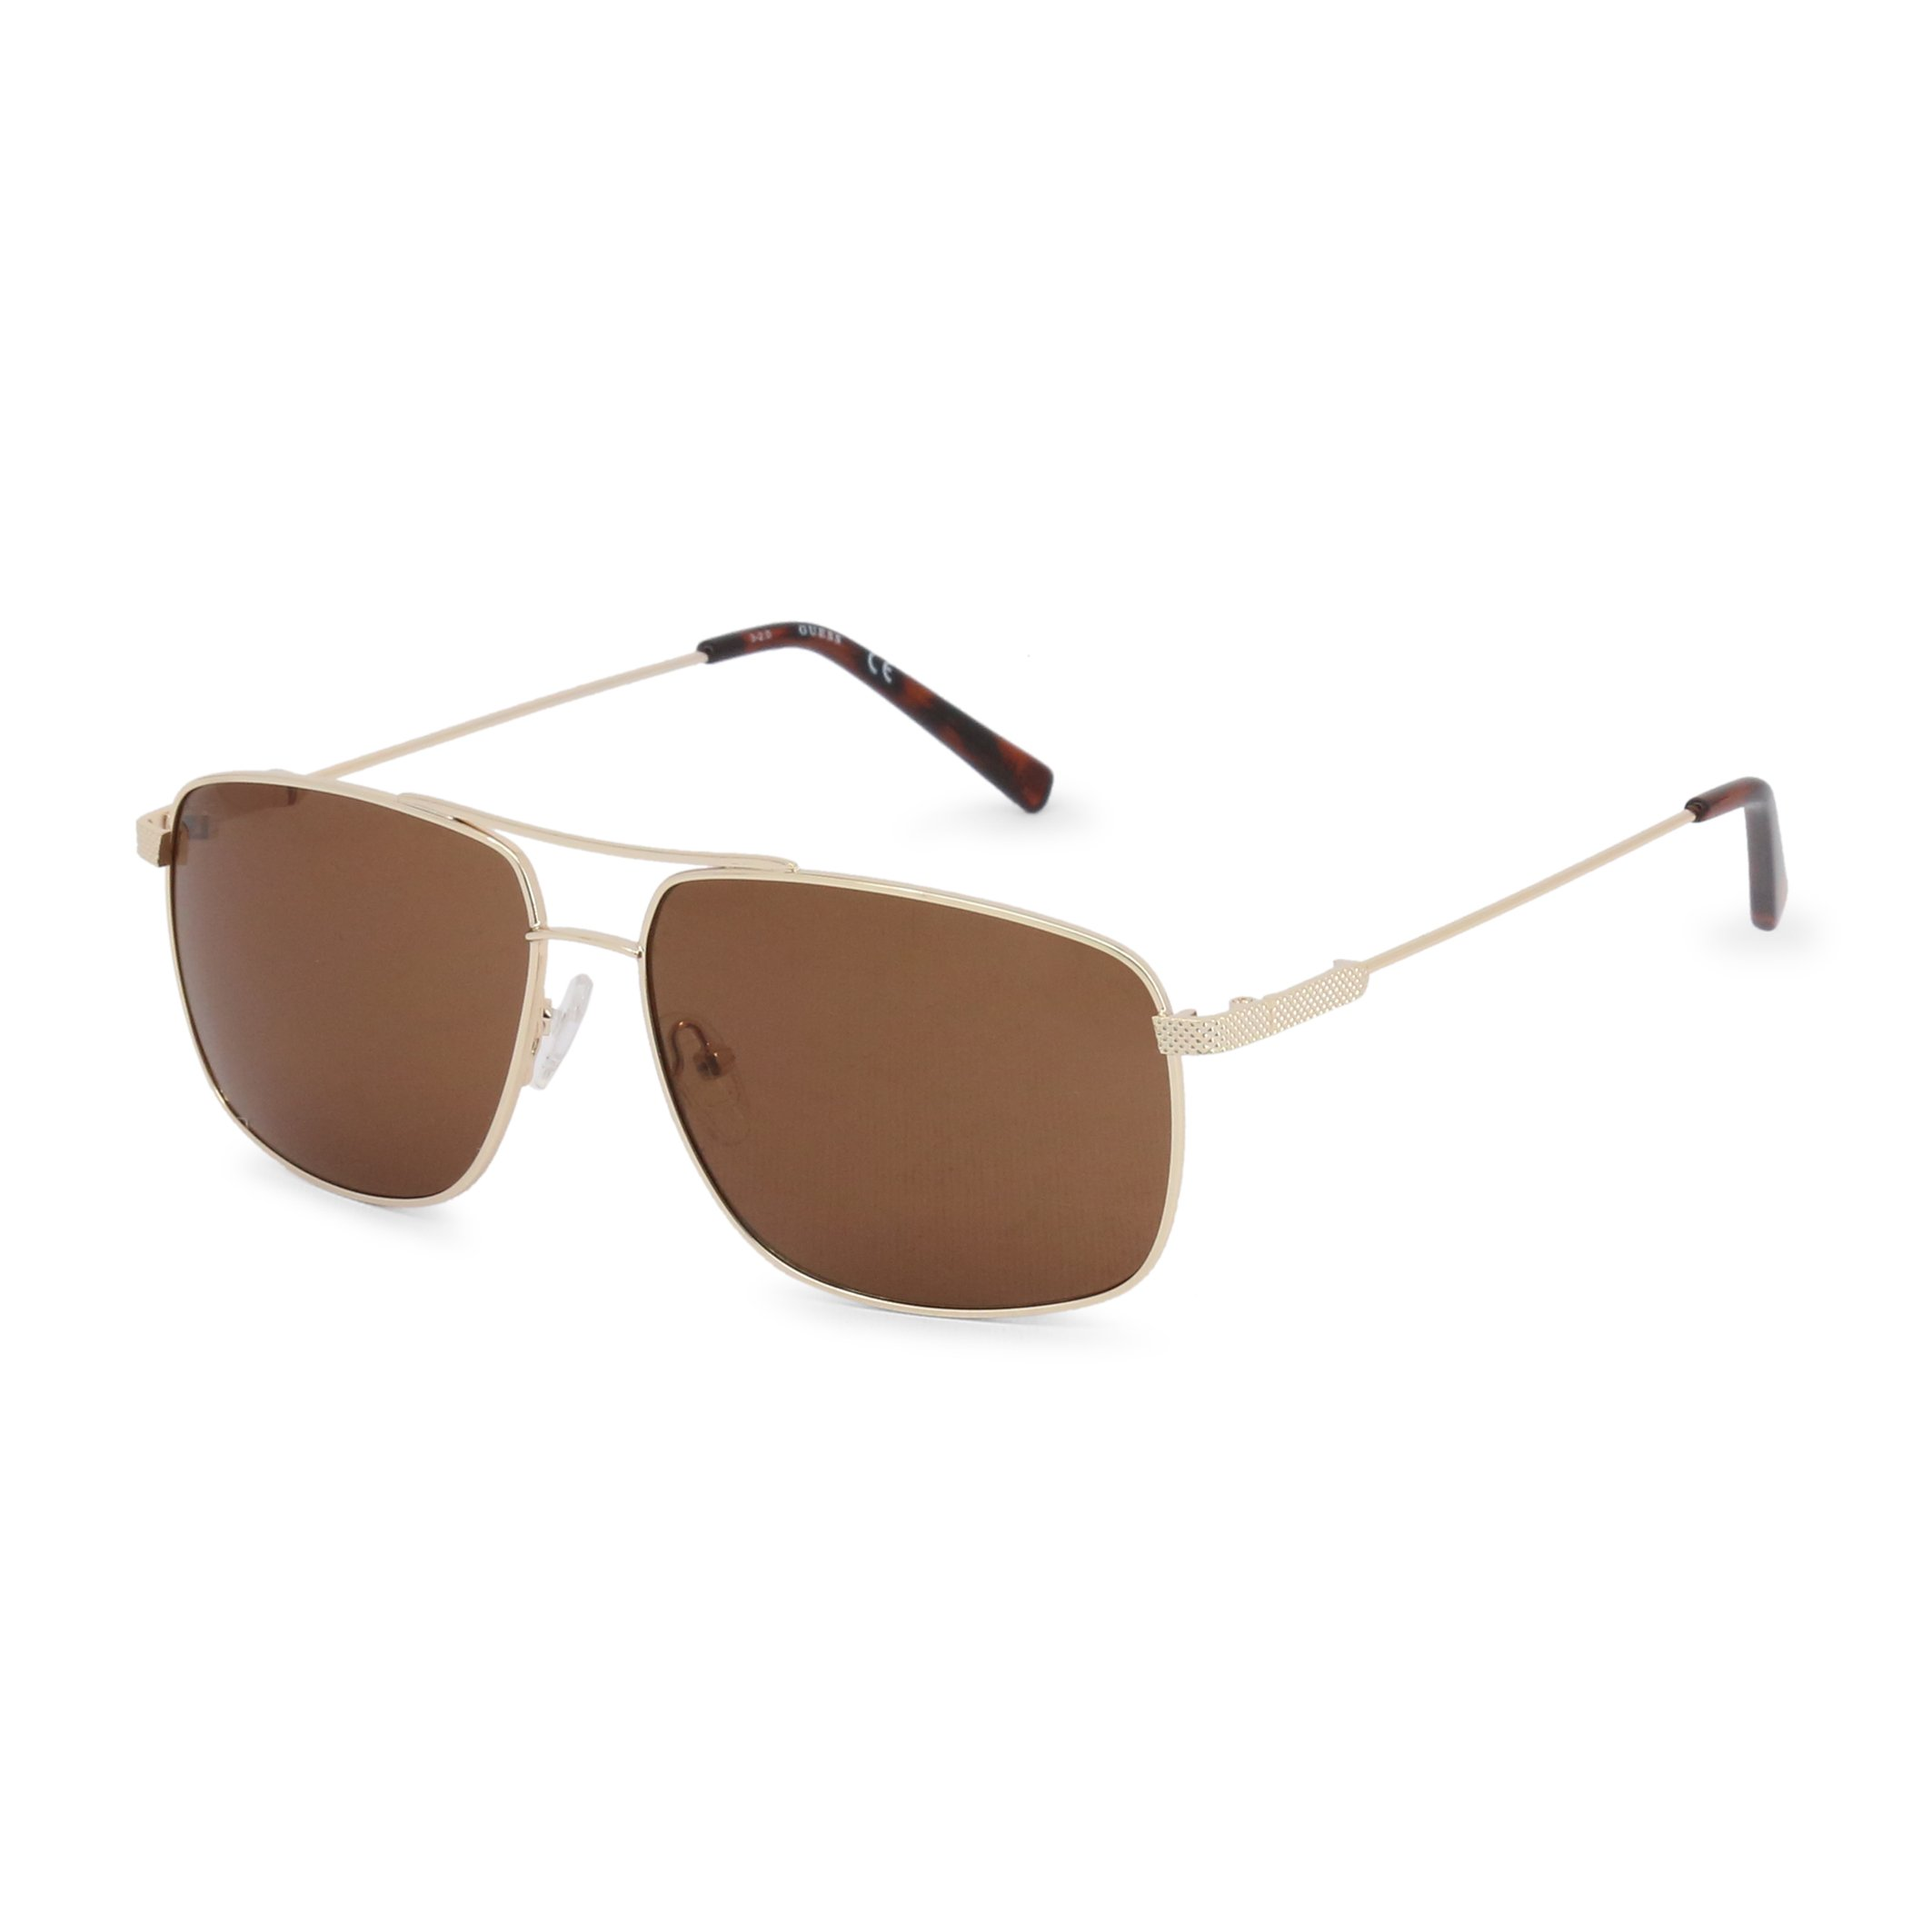 Guess Unisex Sunglasses Various Colours GF0205 - yellow NOSIZE